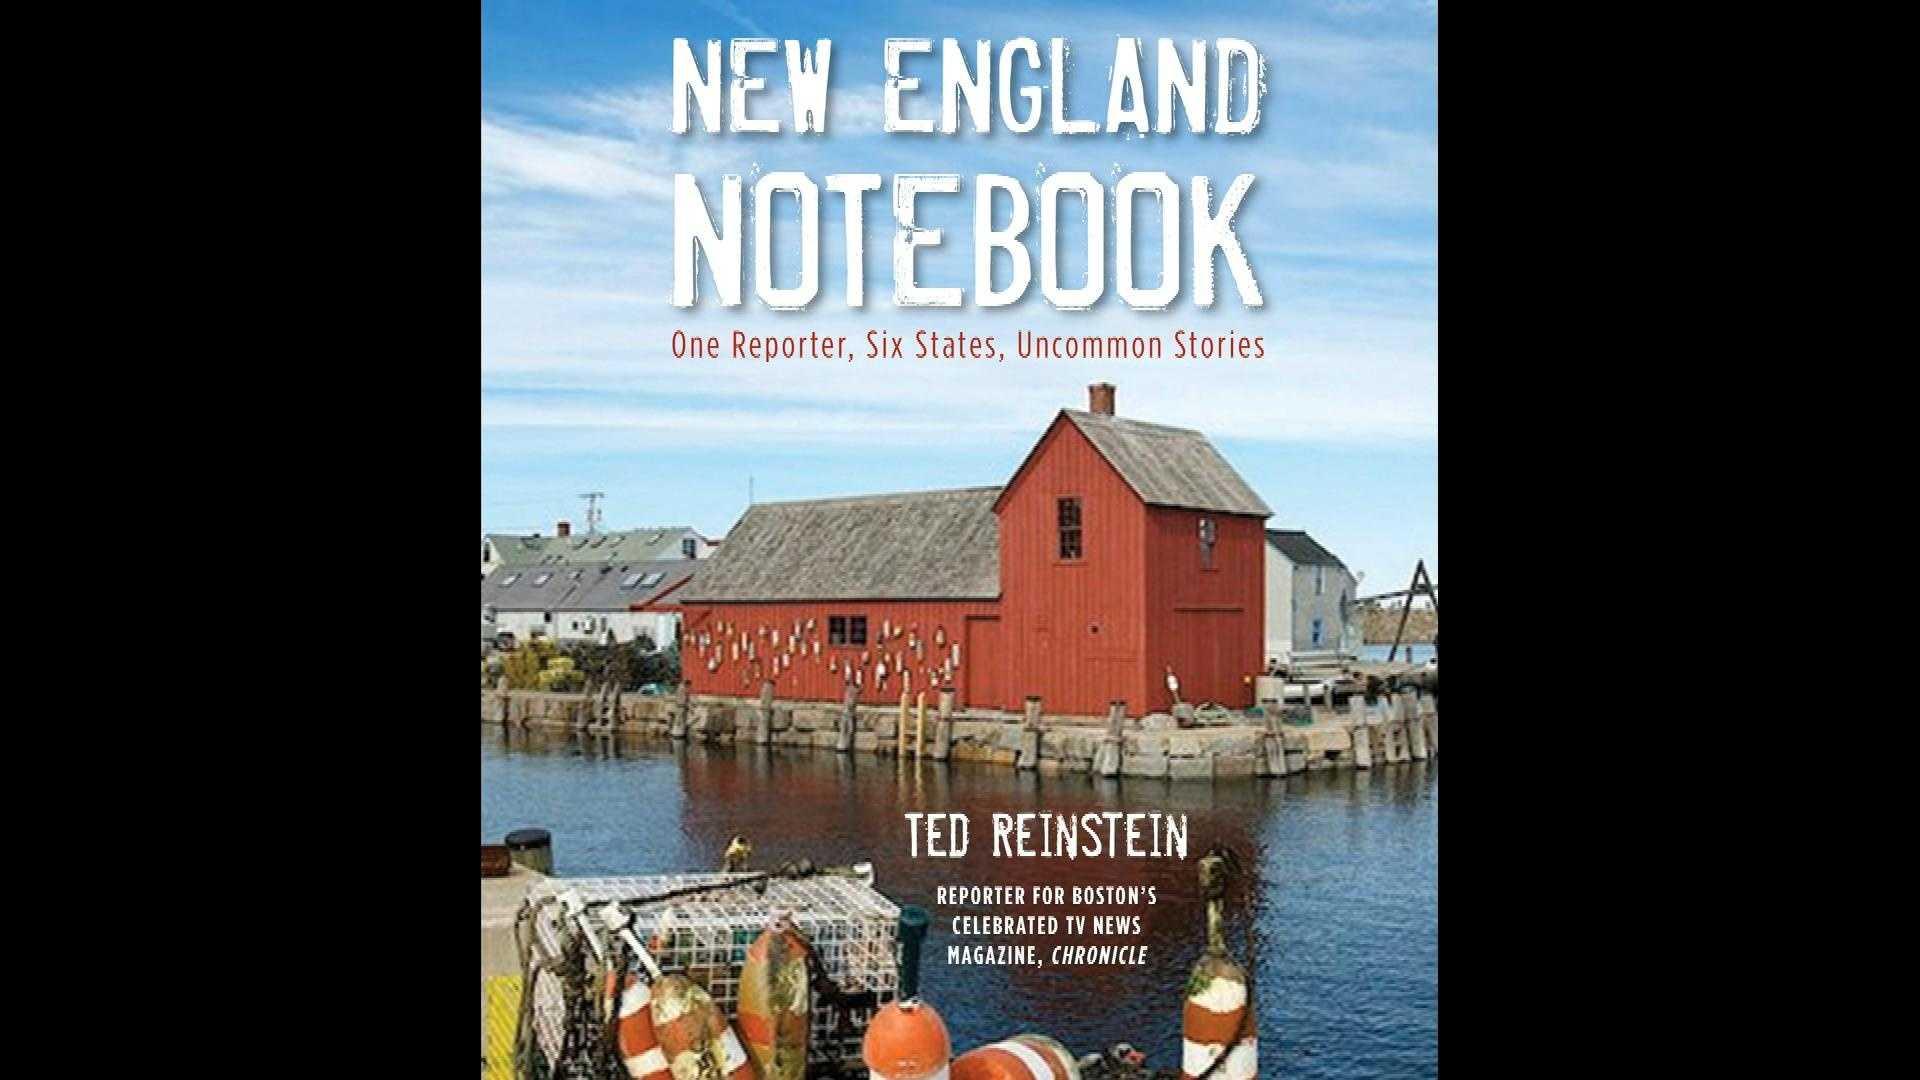 Image: New England Notebook